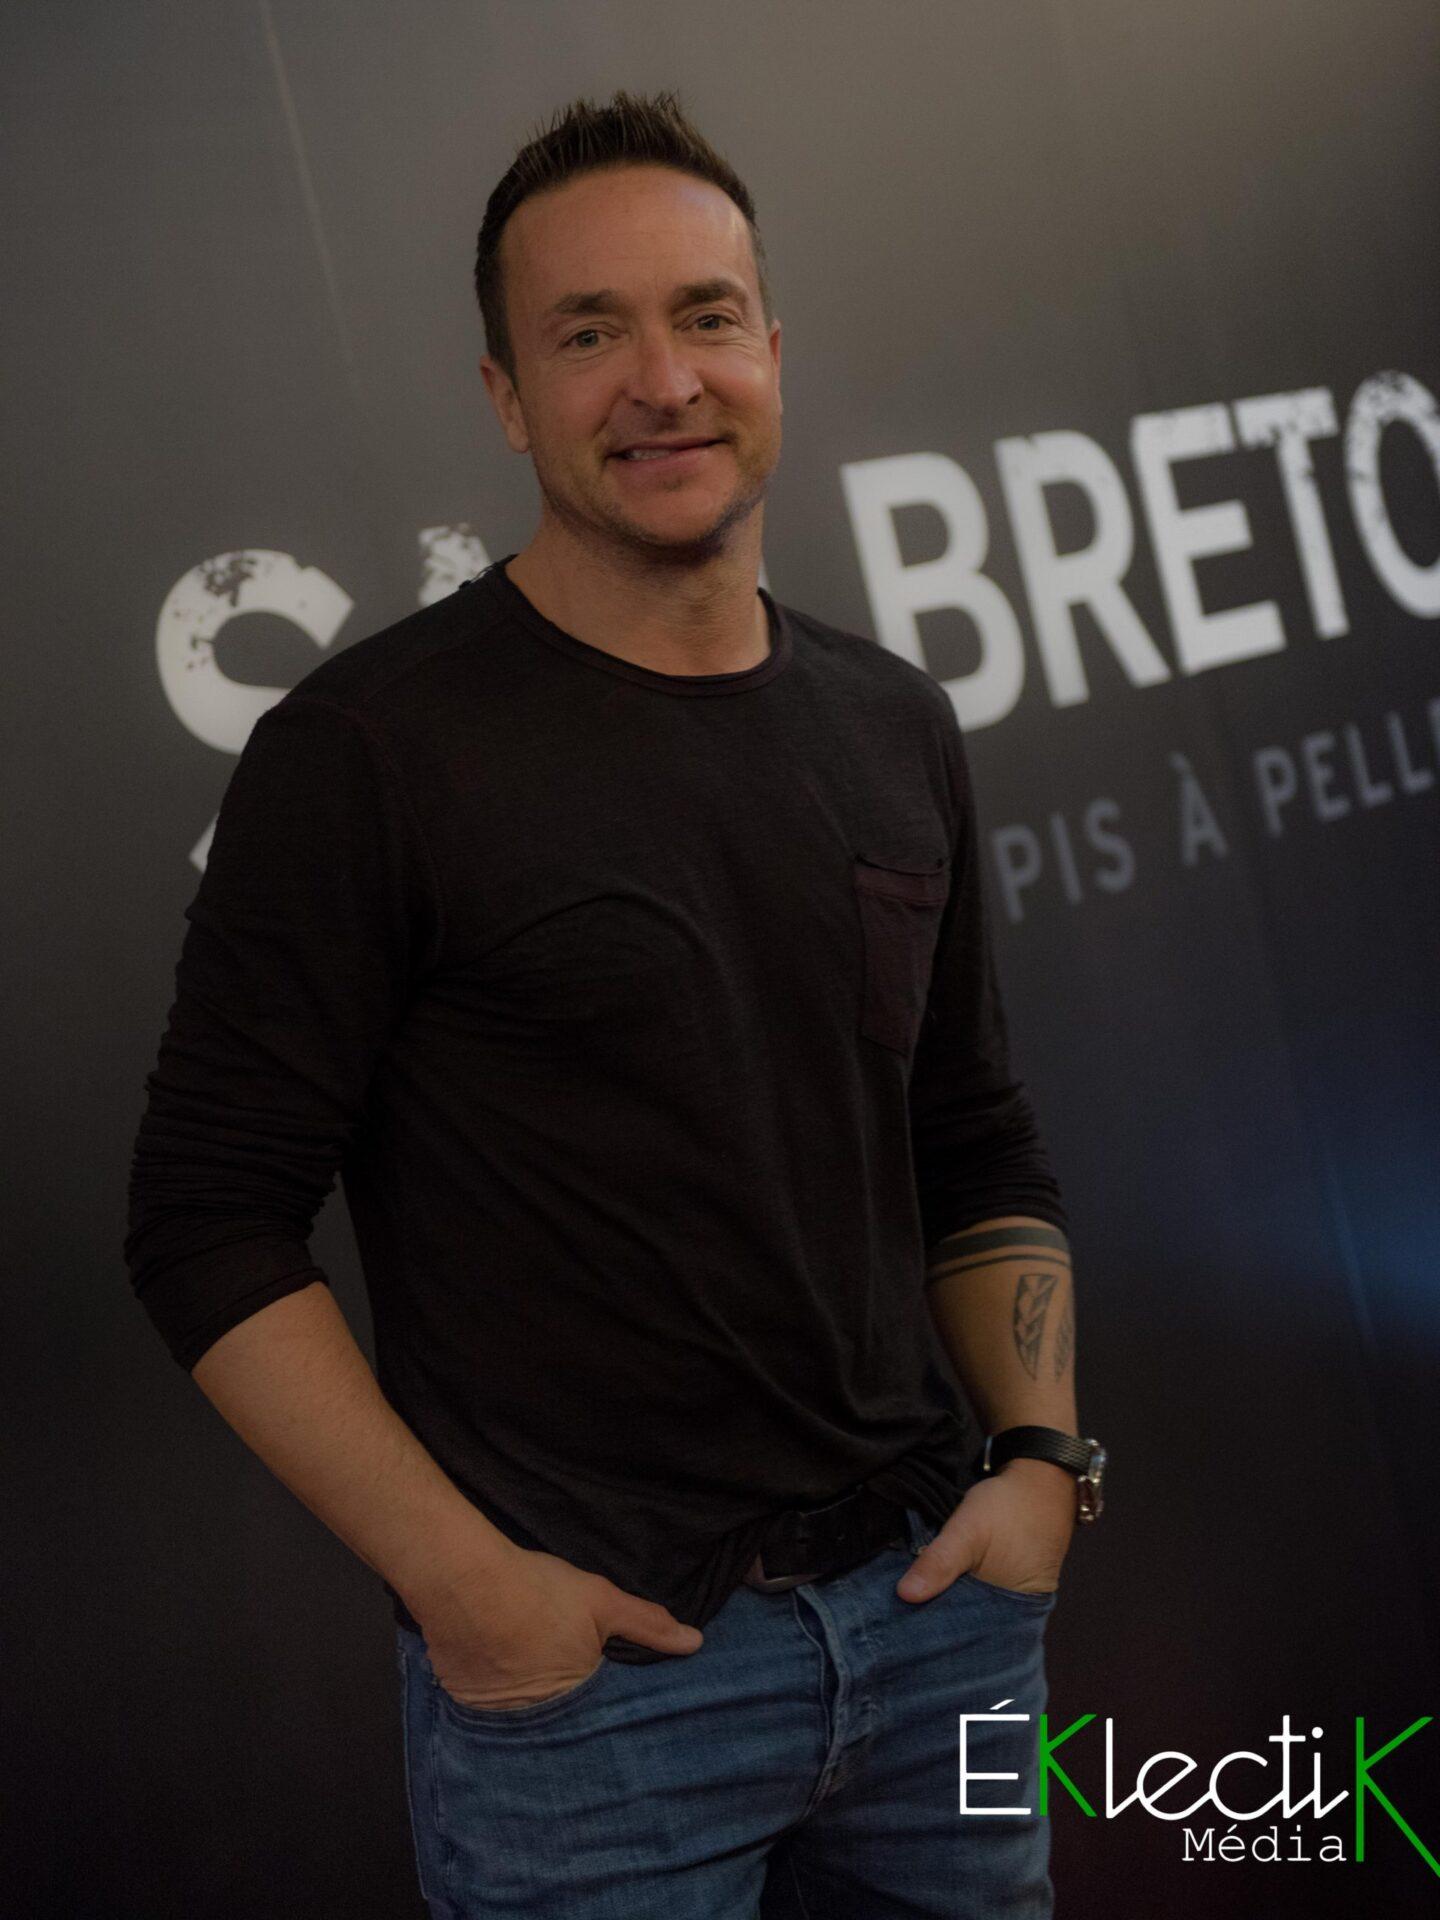 Mario Tessier